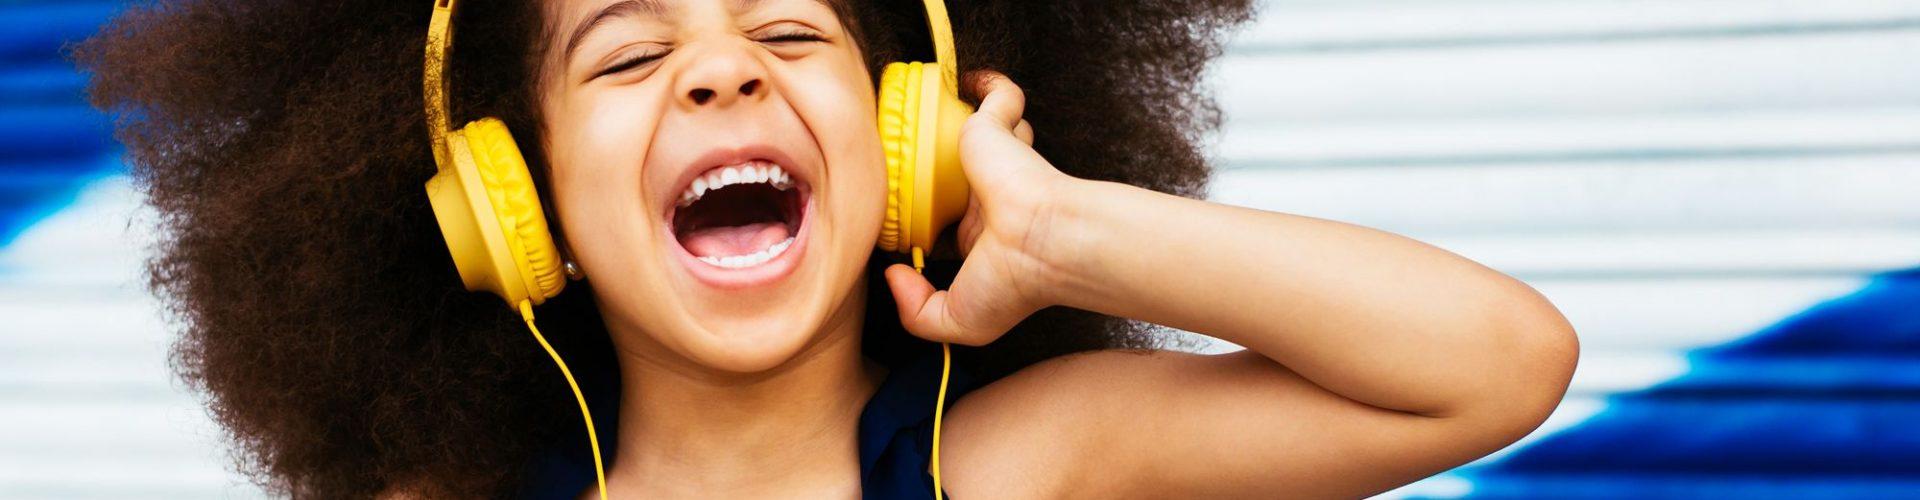 Best Headphones for Kids - KidsGearGuide